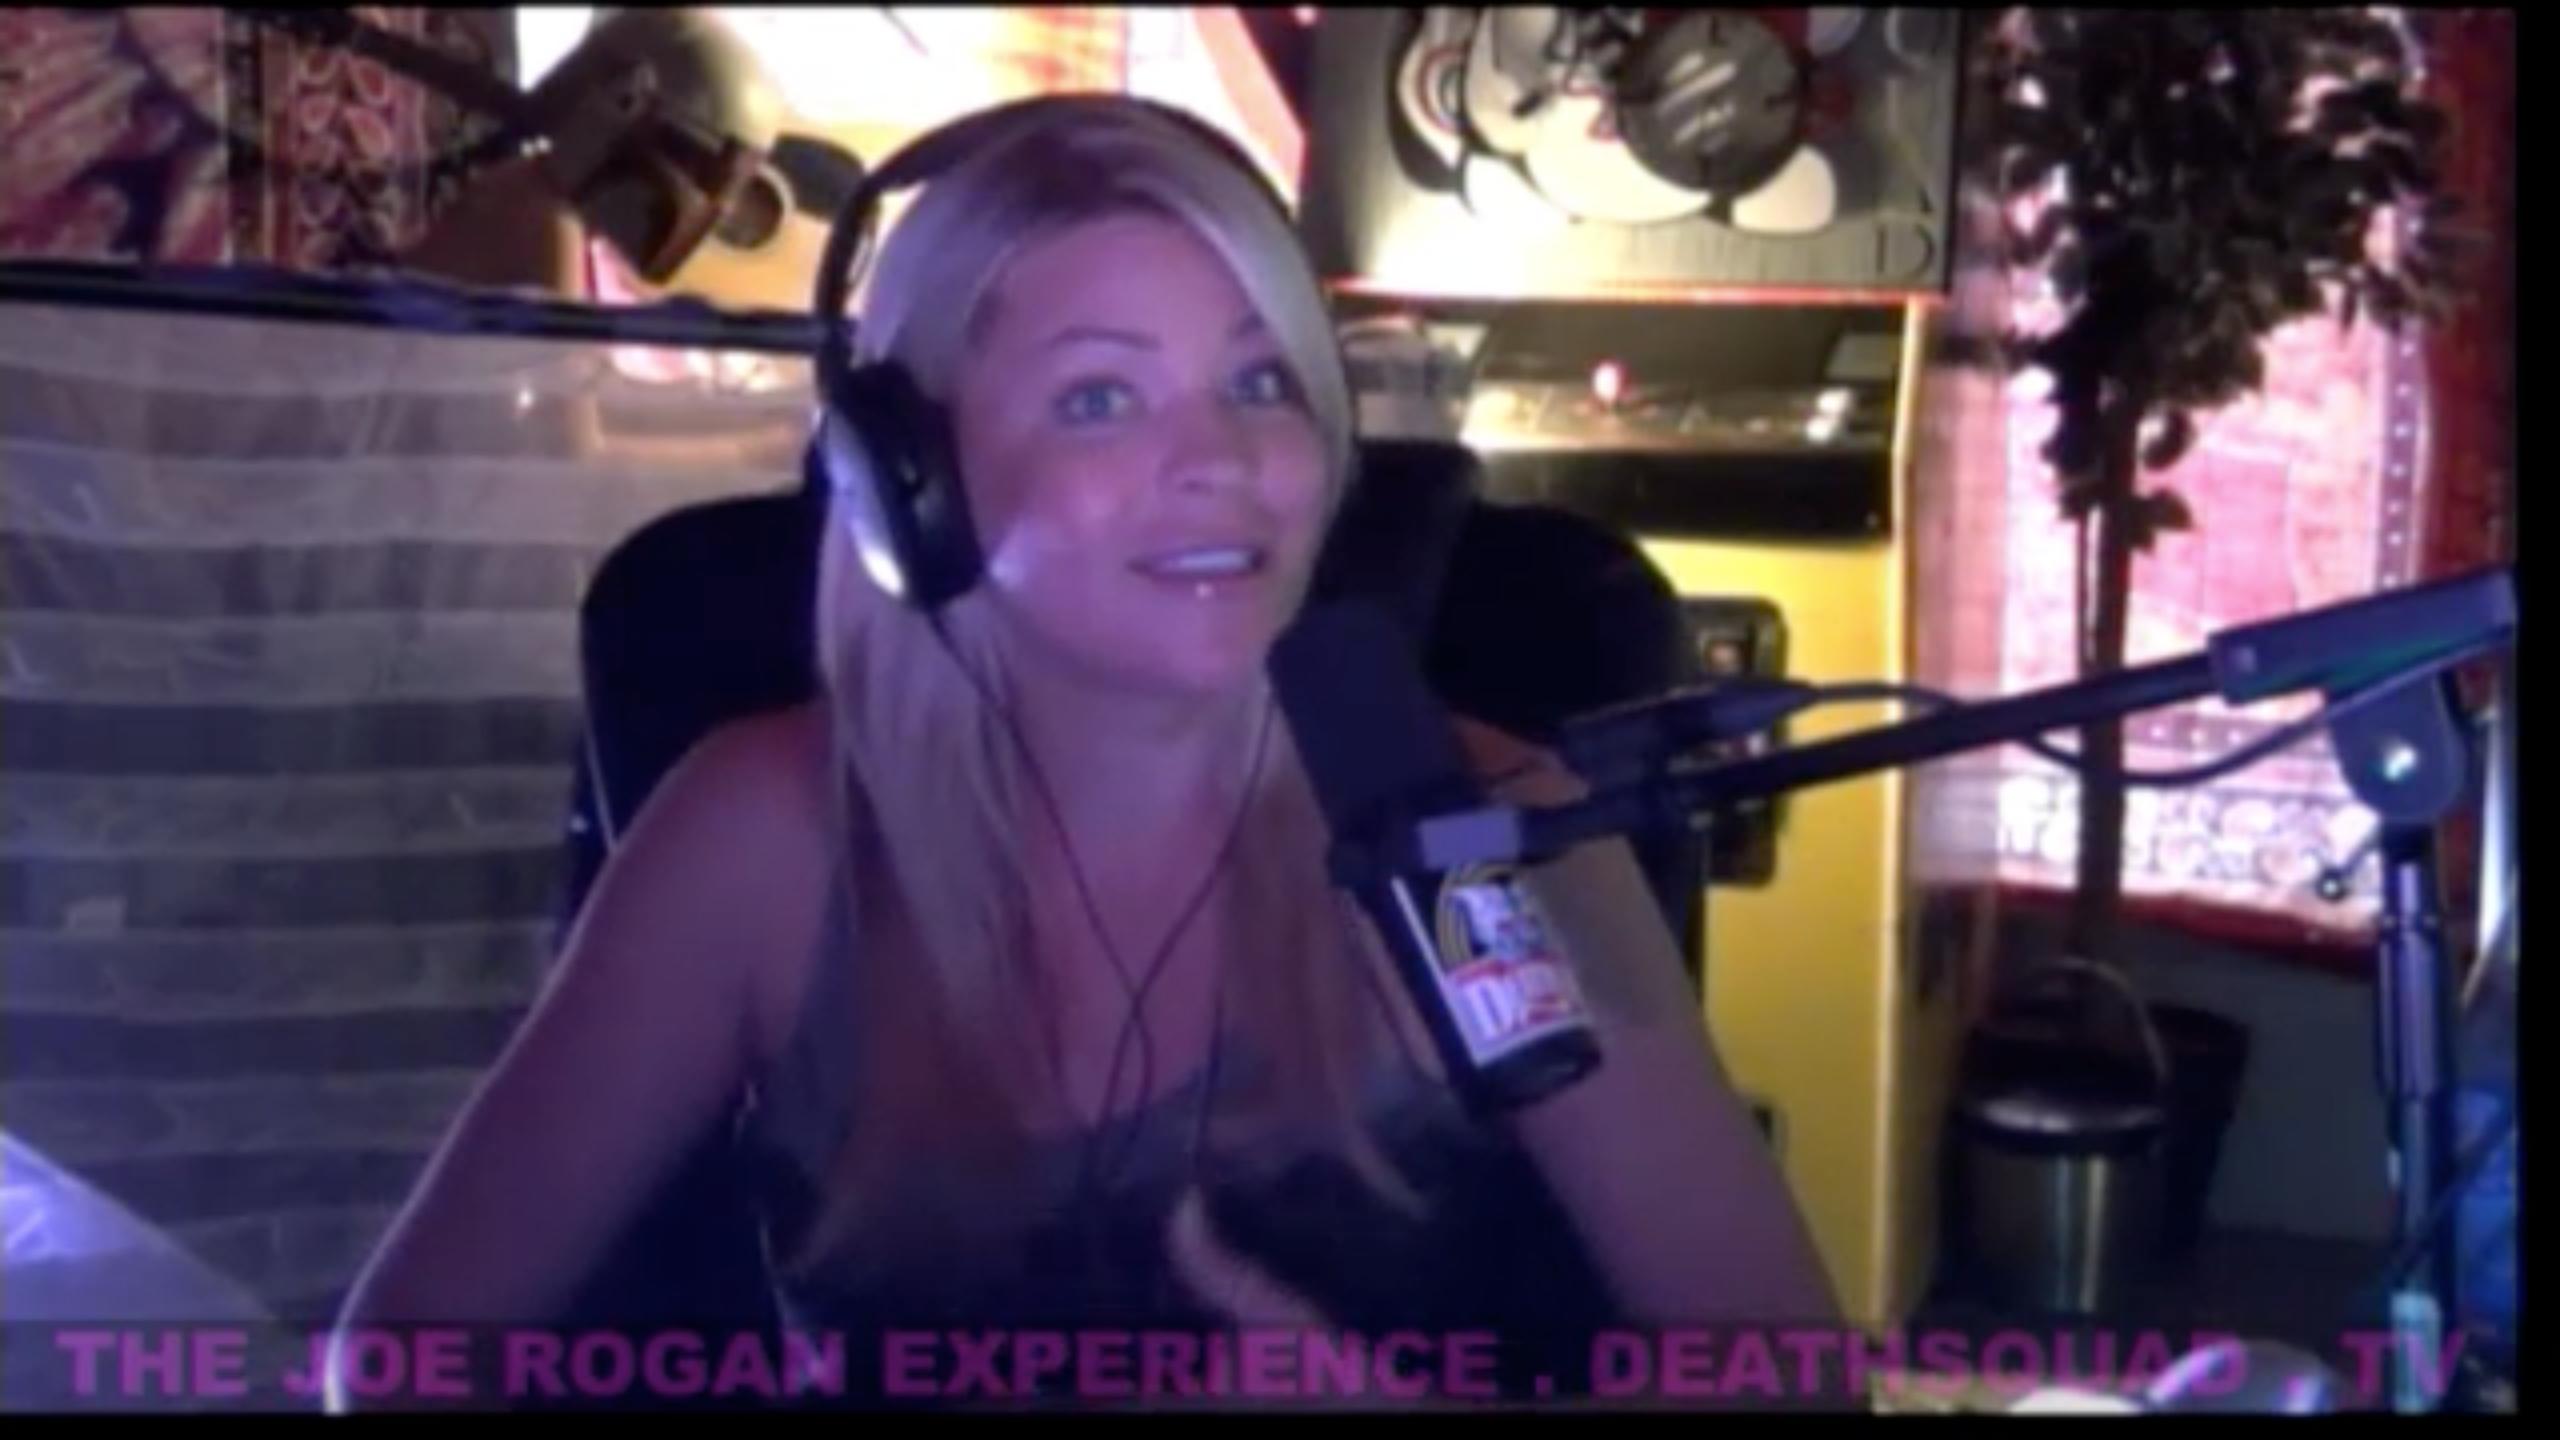 The Joe Rogan Experience #273 - Amber Lyon, Brian Redban